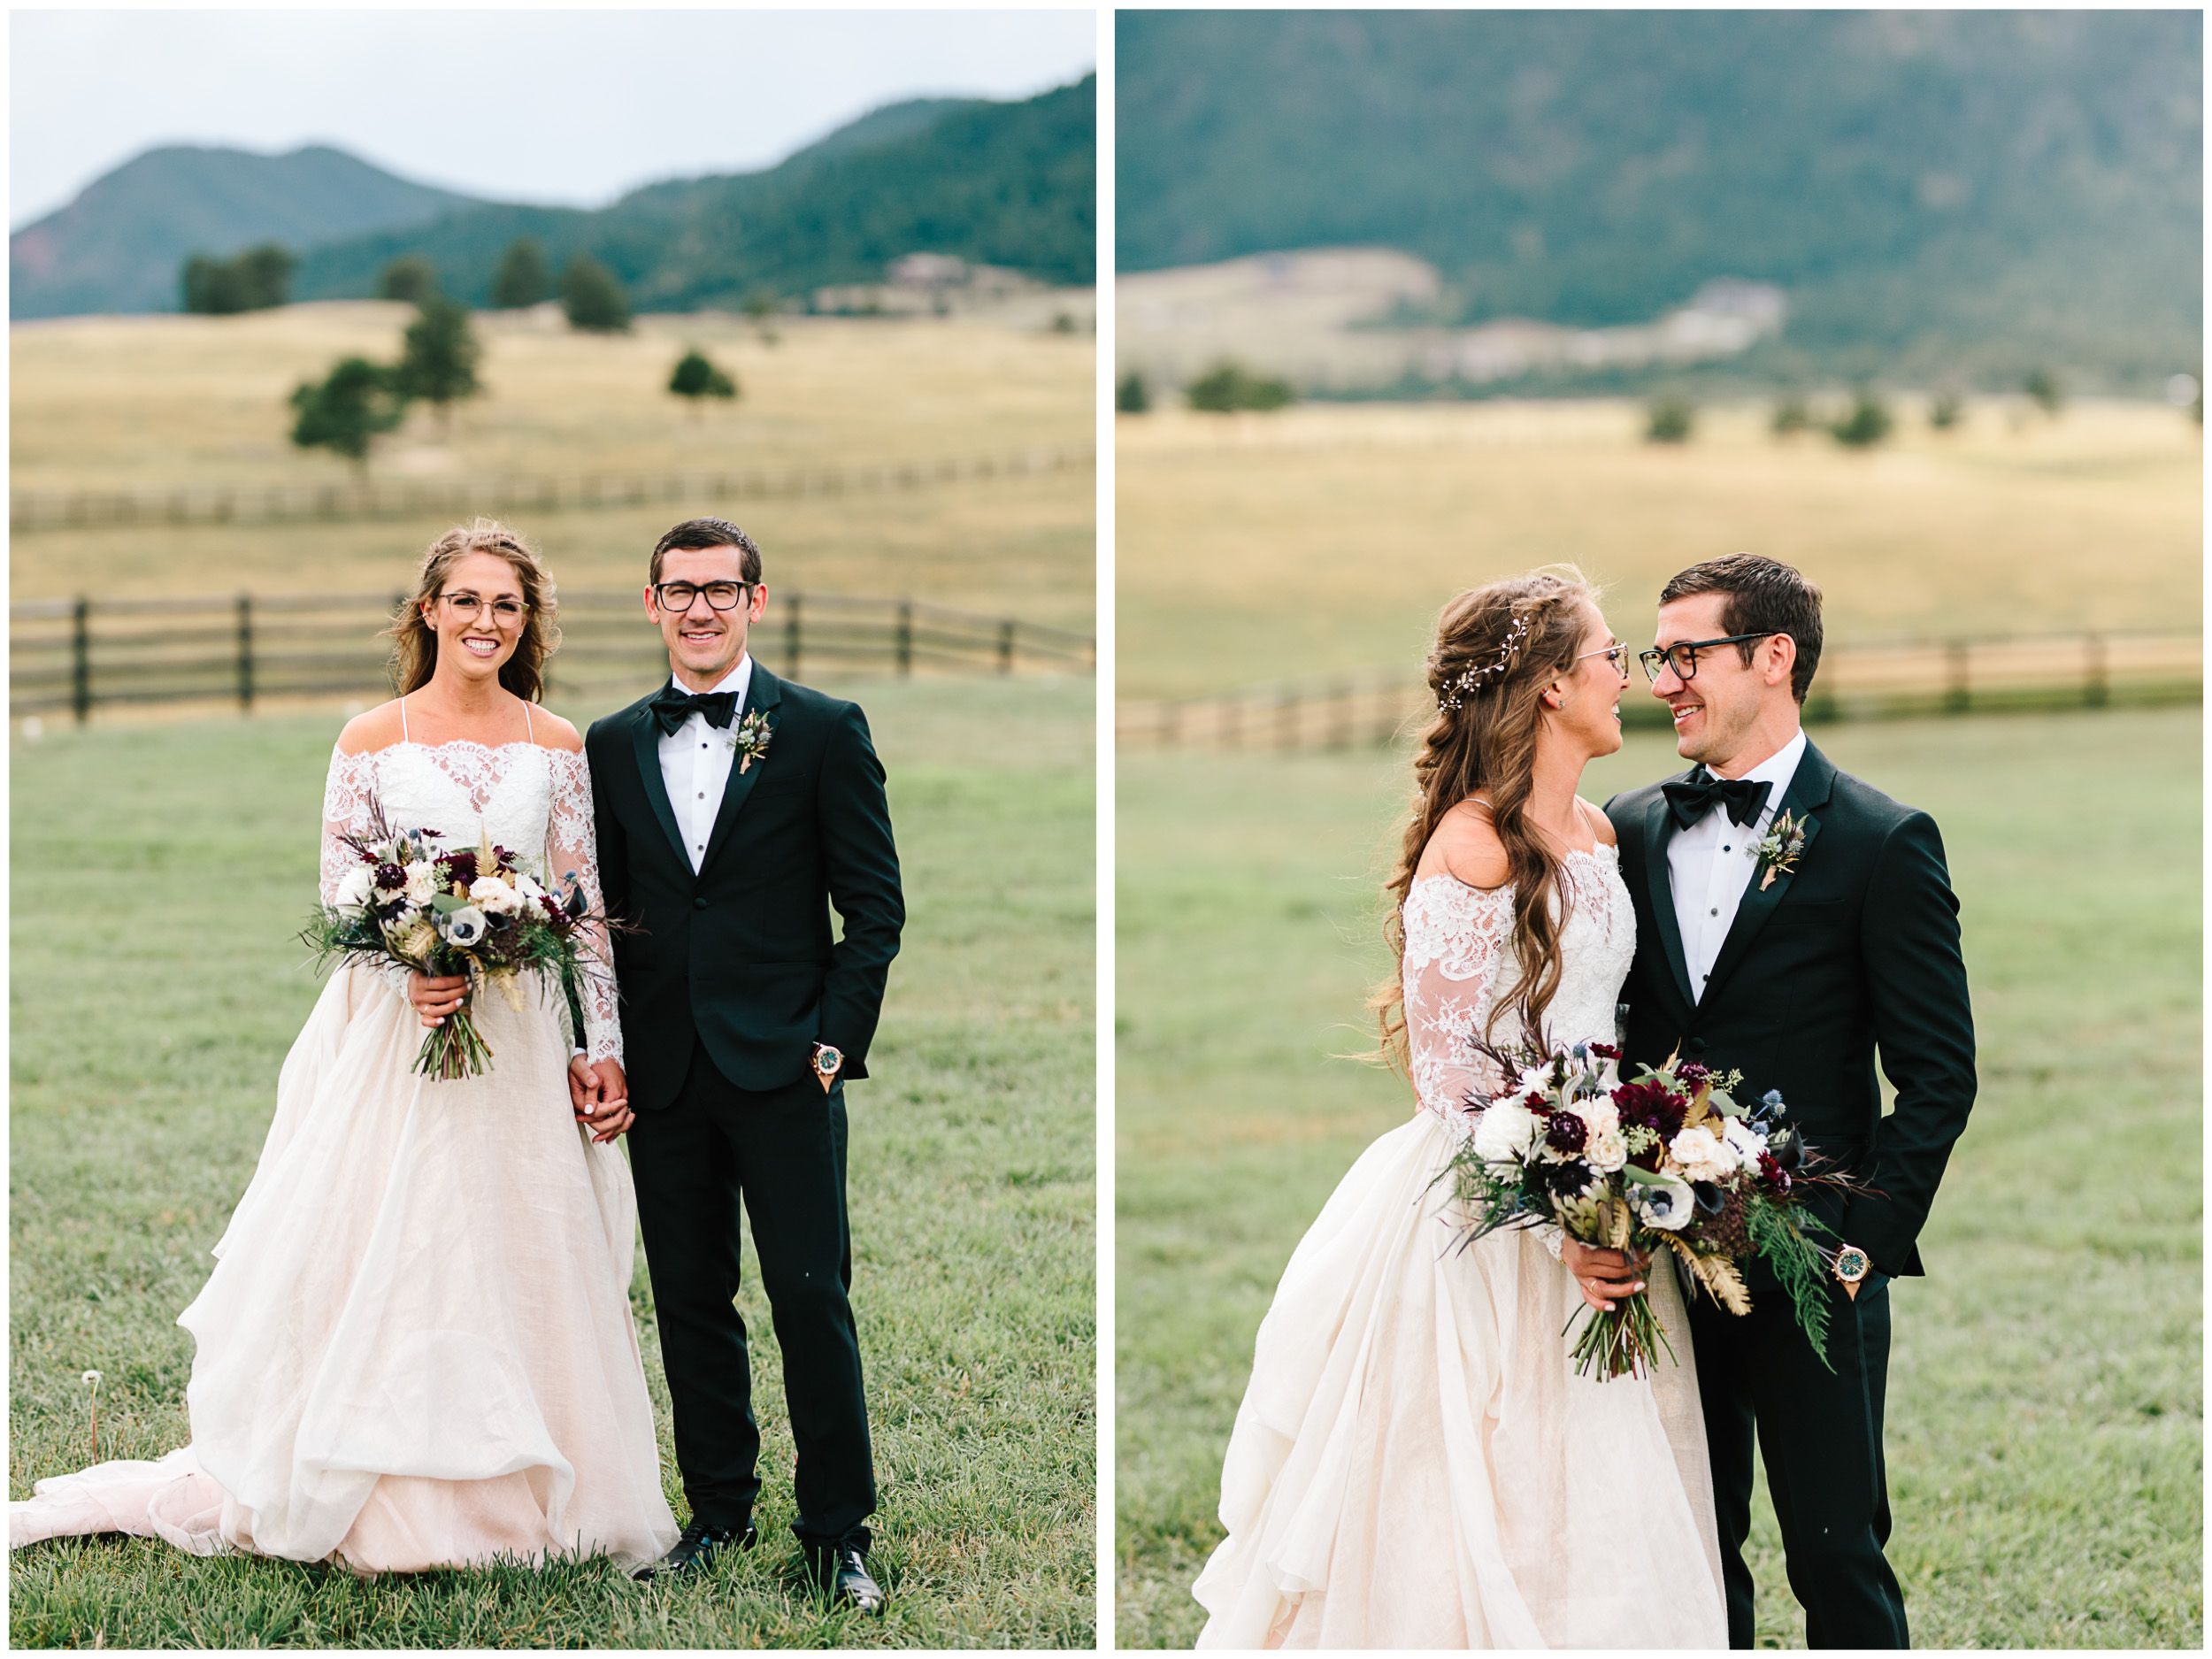 spruce_mountain_ranch_wedding_24.jpg